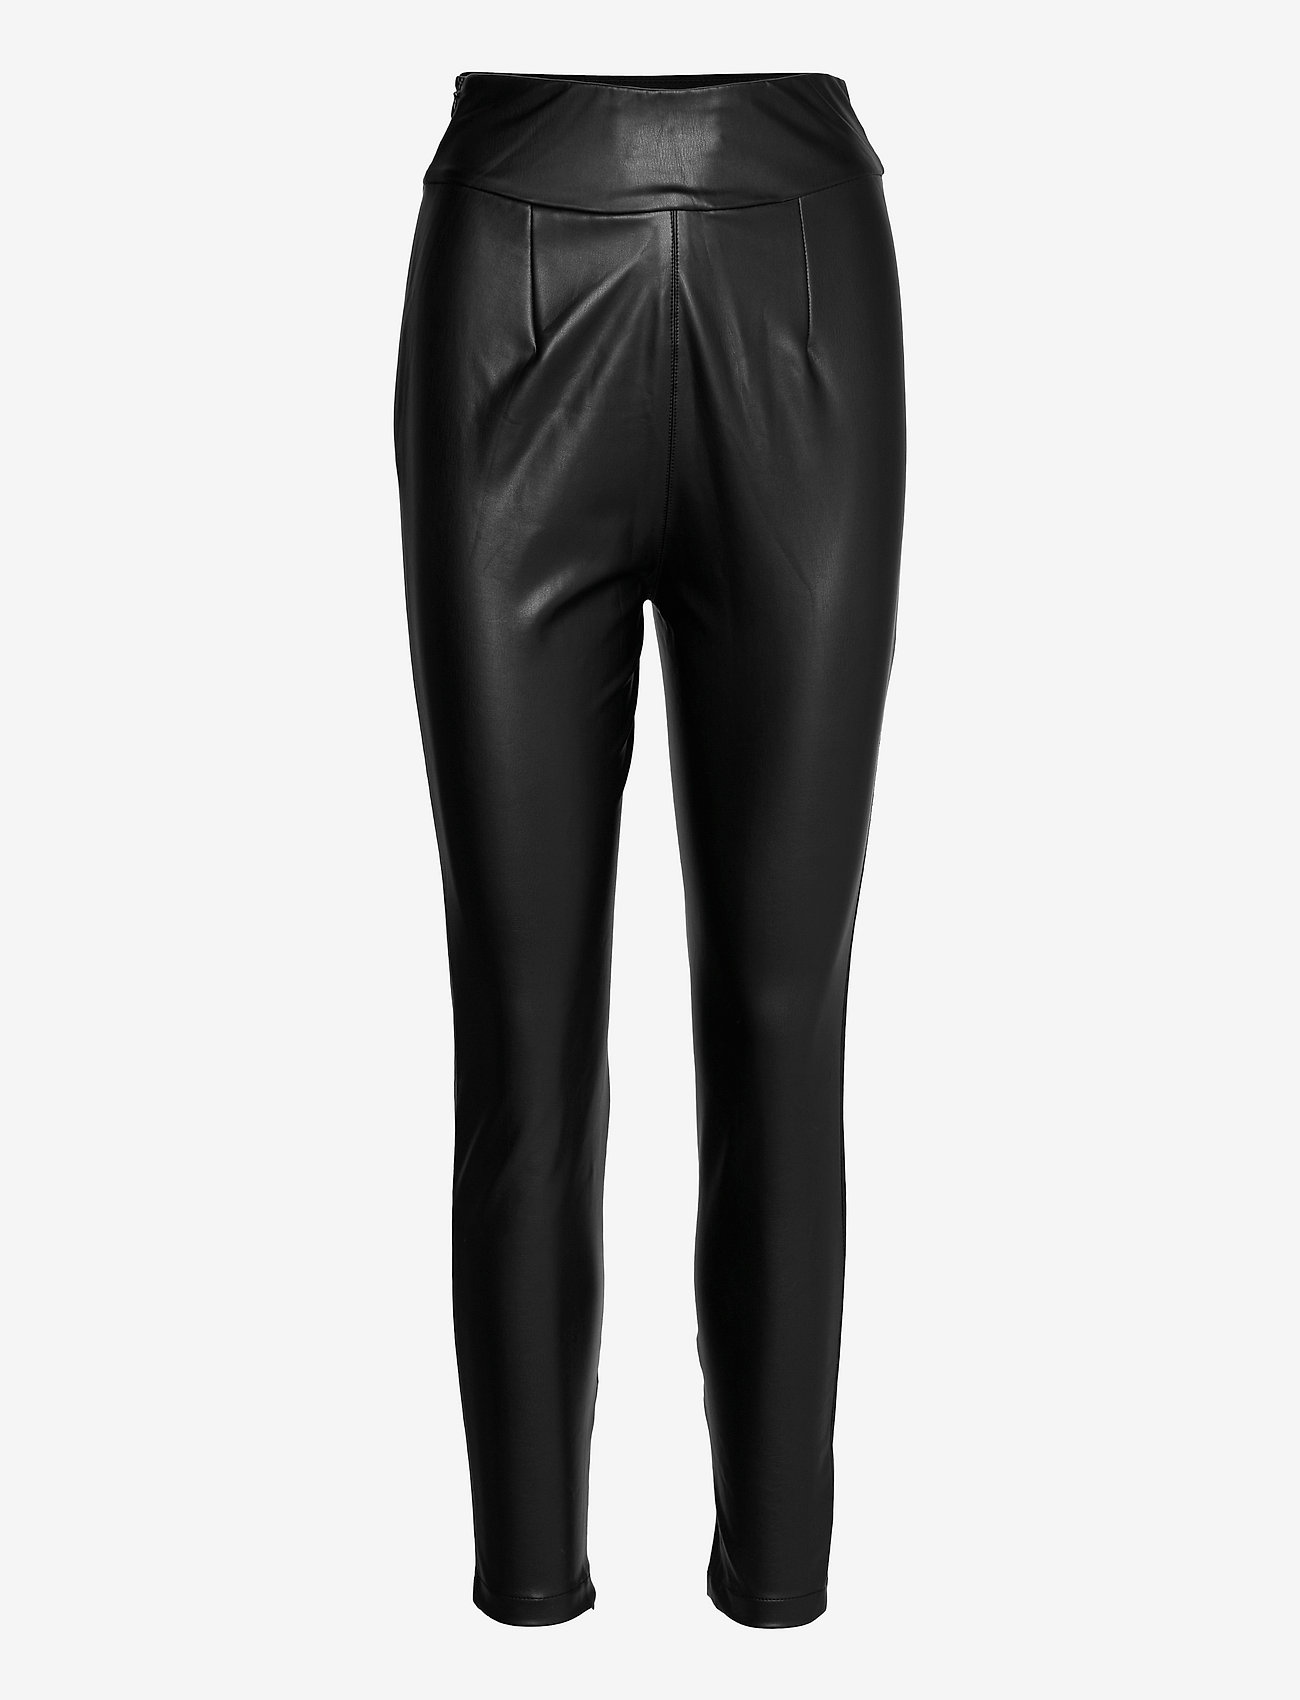 GUESS Jeans - PRISCILLA LEGGINGS - skinnbyxor - jet black a996 - 0